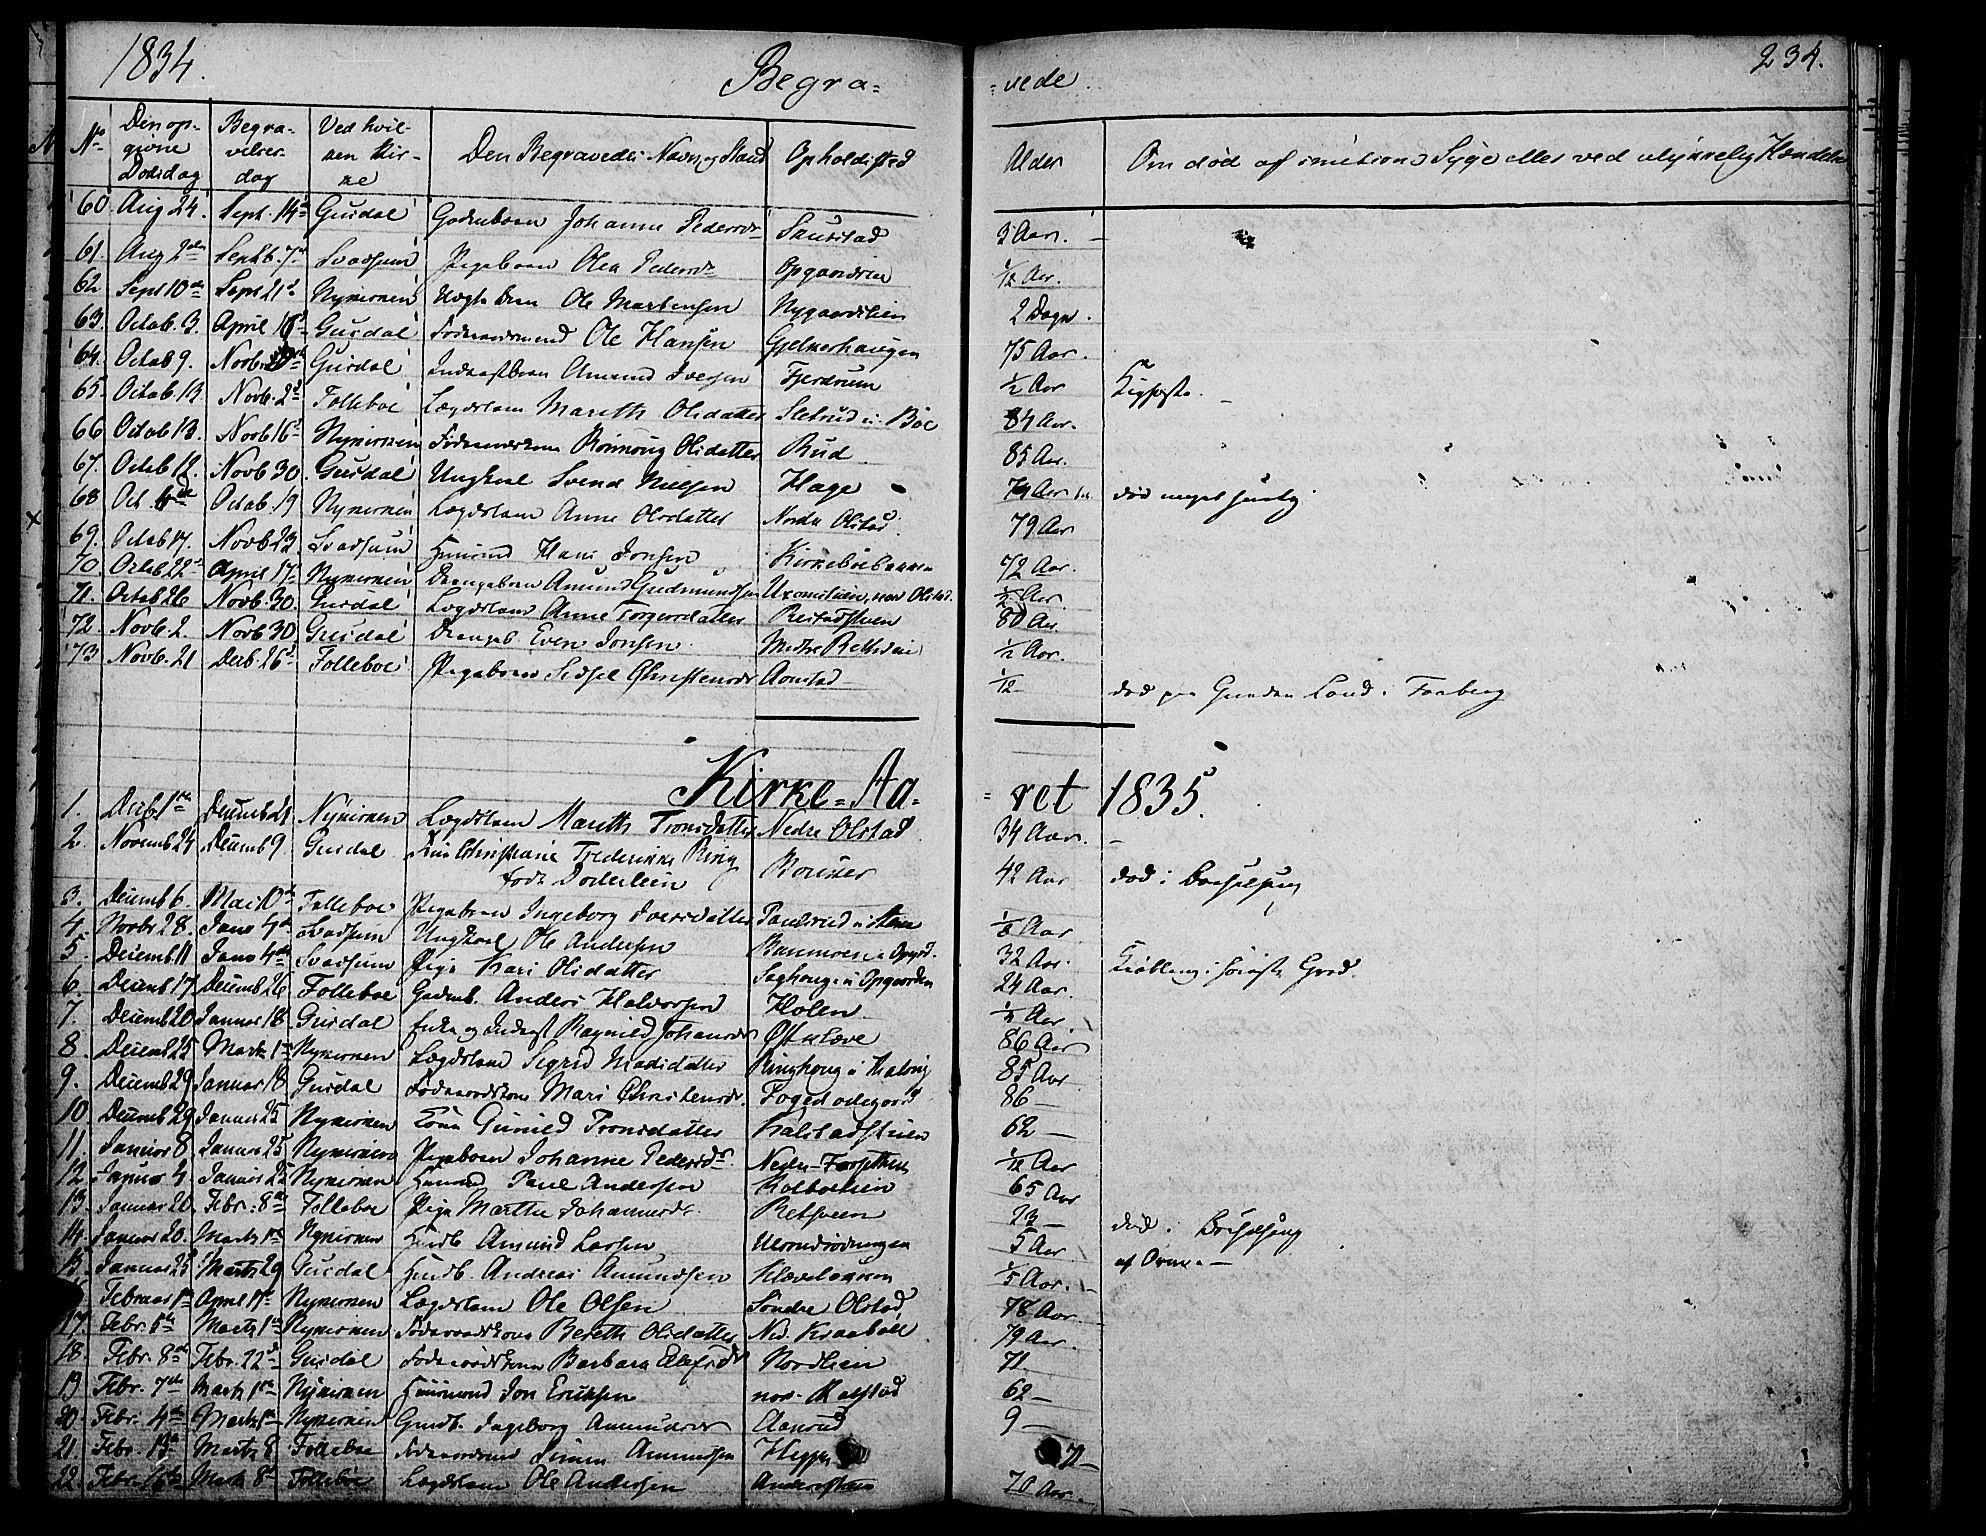 SAH, Gausdal prestekontor, Ministerialbok nr. 6, 1830-1839, s. 234